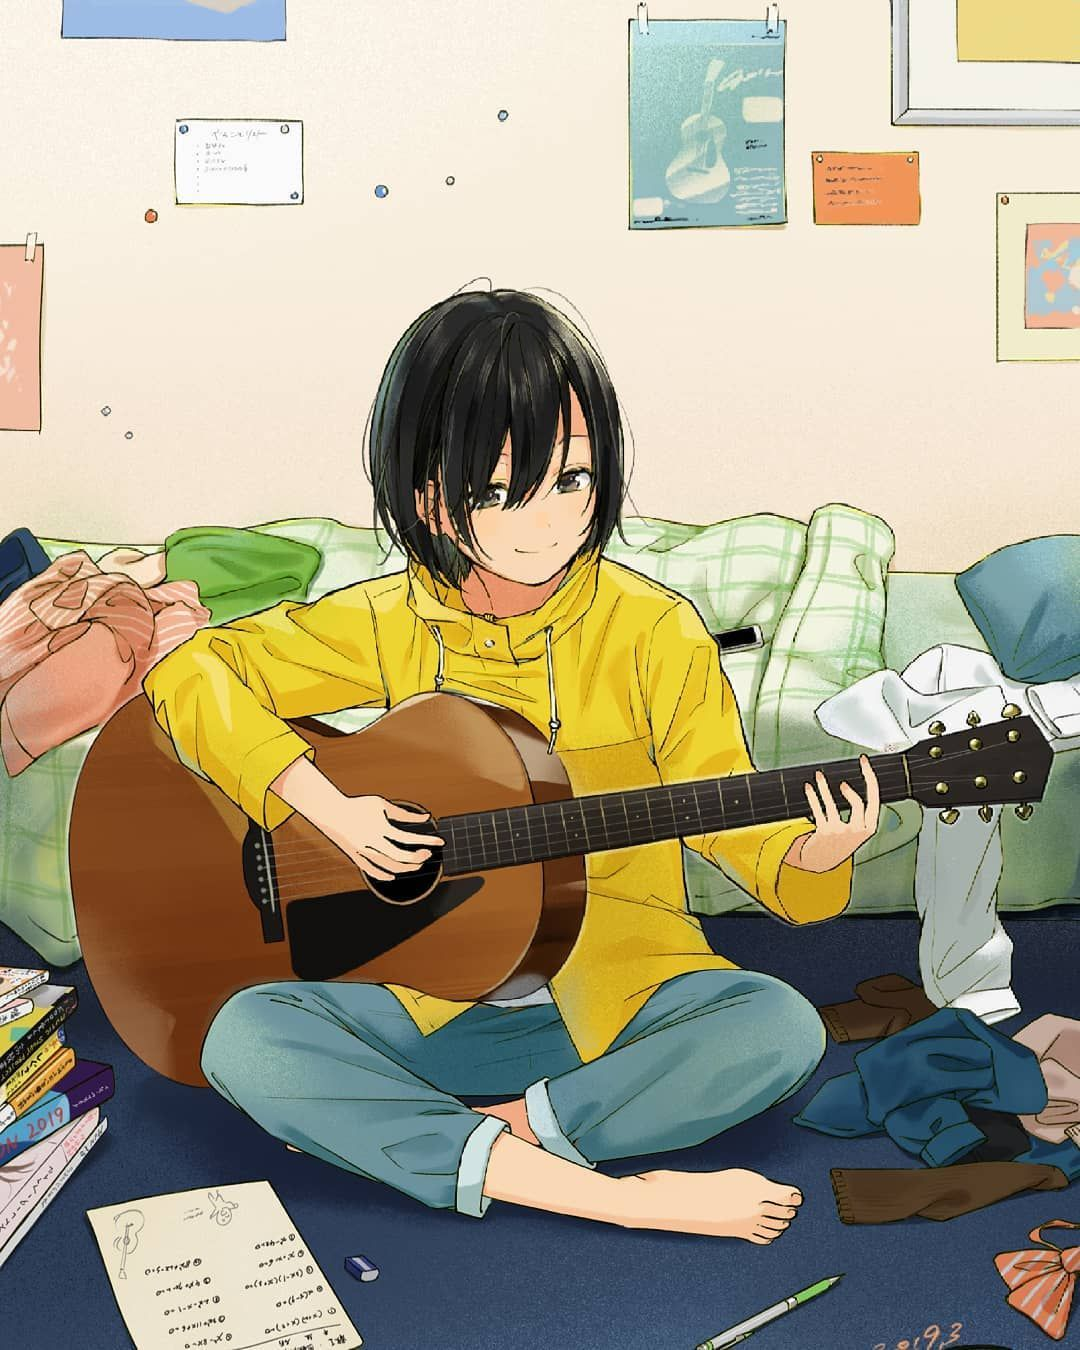 Anime Animegirl Animeart Guitar Animeguitar Kawaii Cute Kawaiigirl Cutegirl Anime Animegirl Animeart Ilustrasi Karakter Ilustrasi Komik Ilustrasi